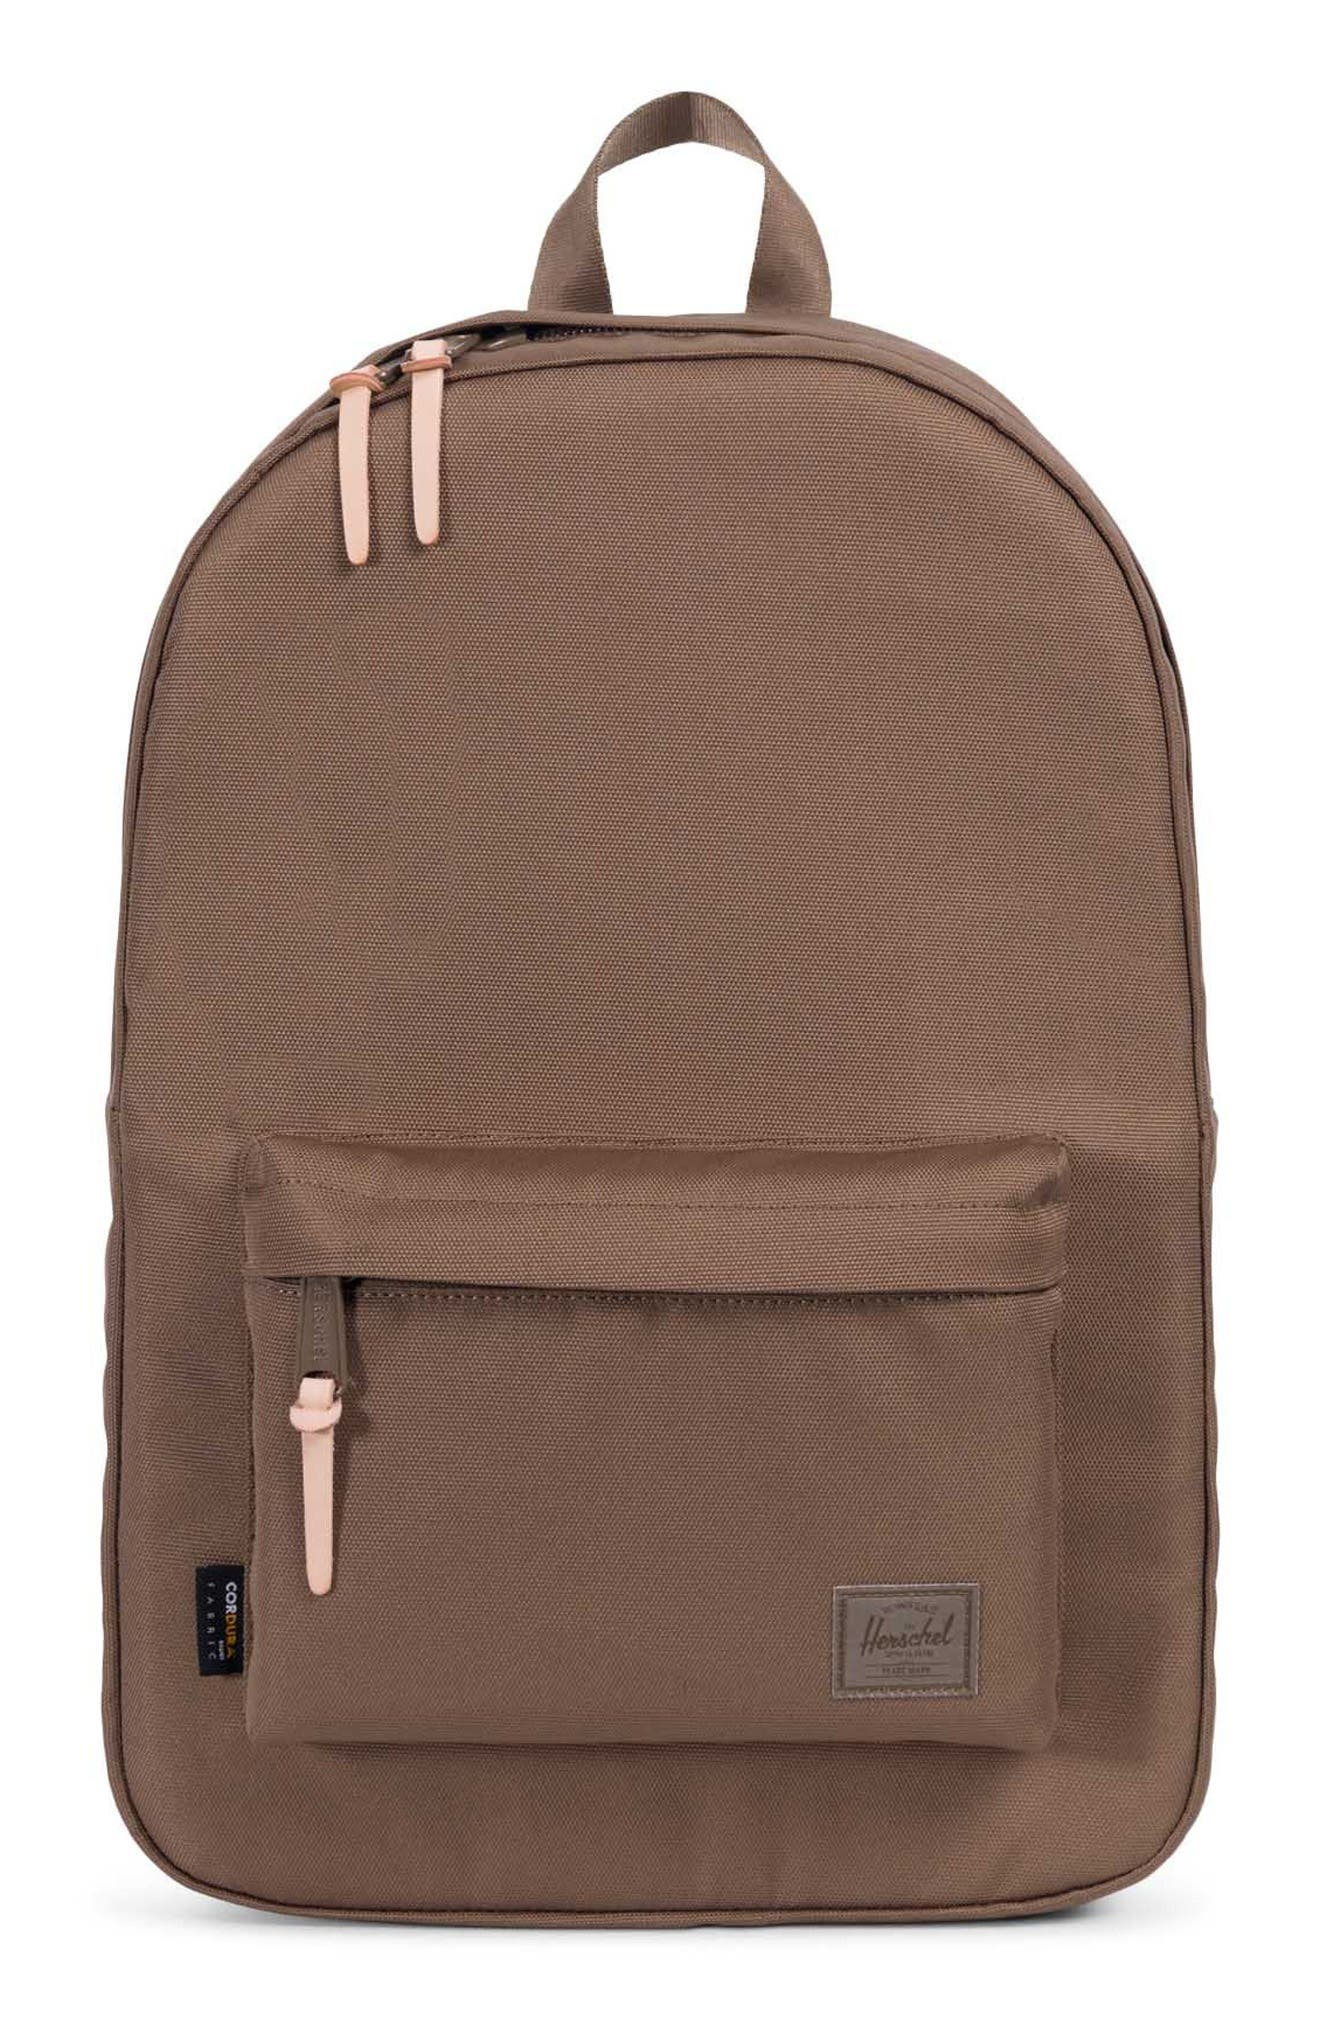 Winlaw Backpack,                             Main thumbnail 1, color,                             Cub